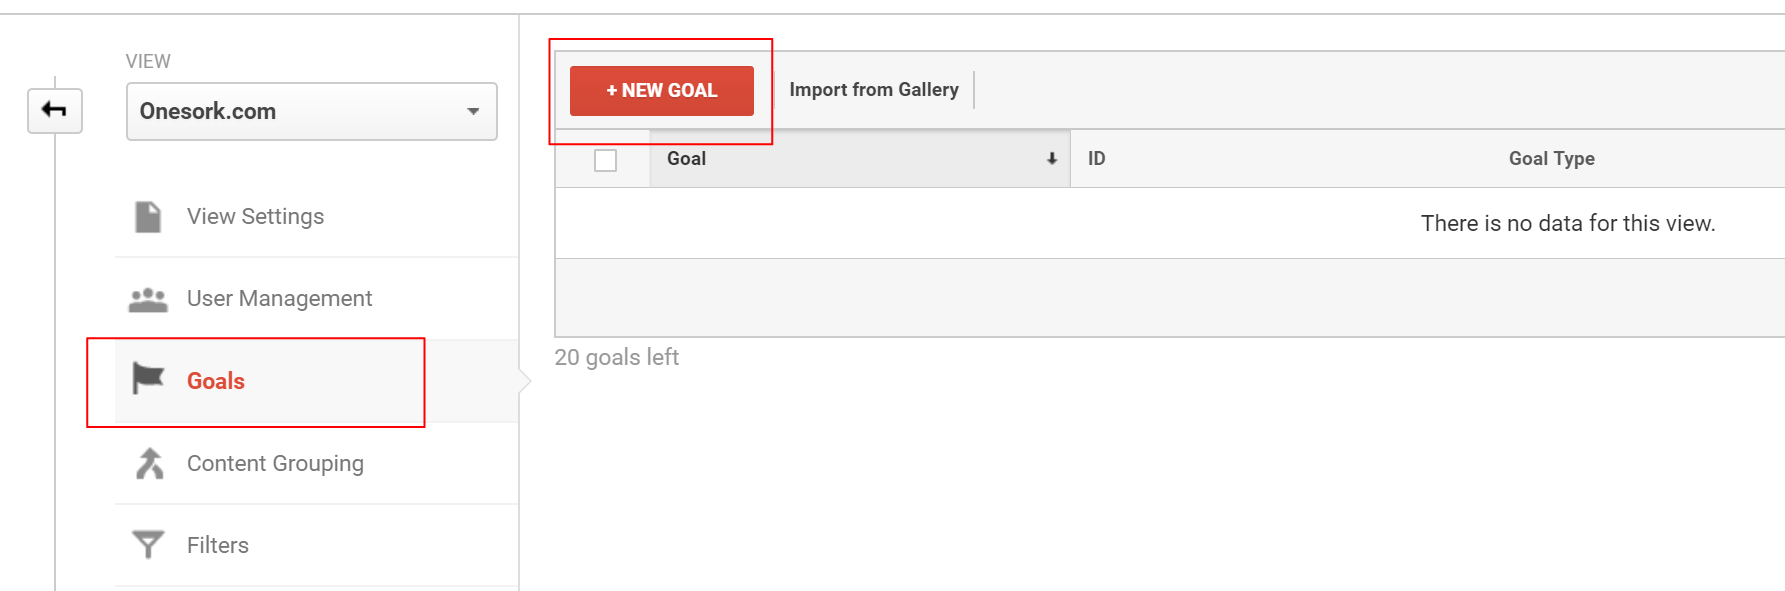 Google Analytics: Set up conversion tracking